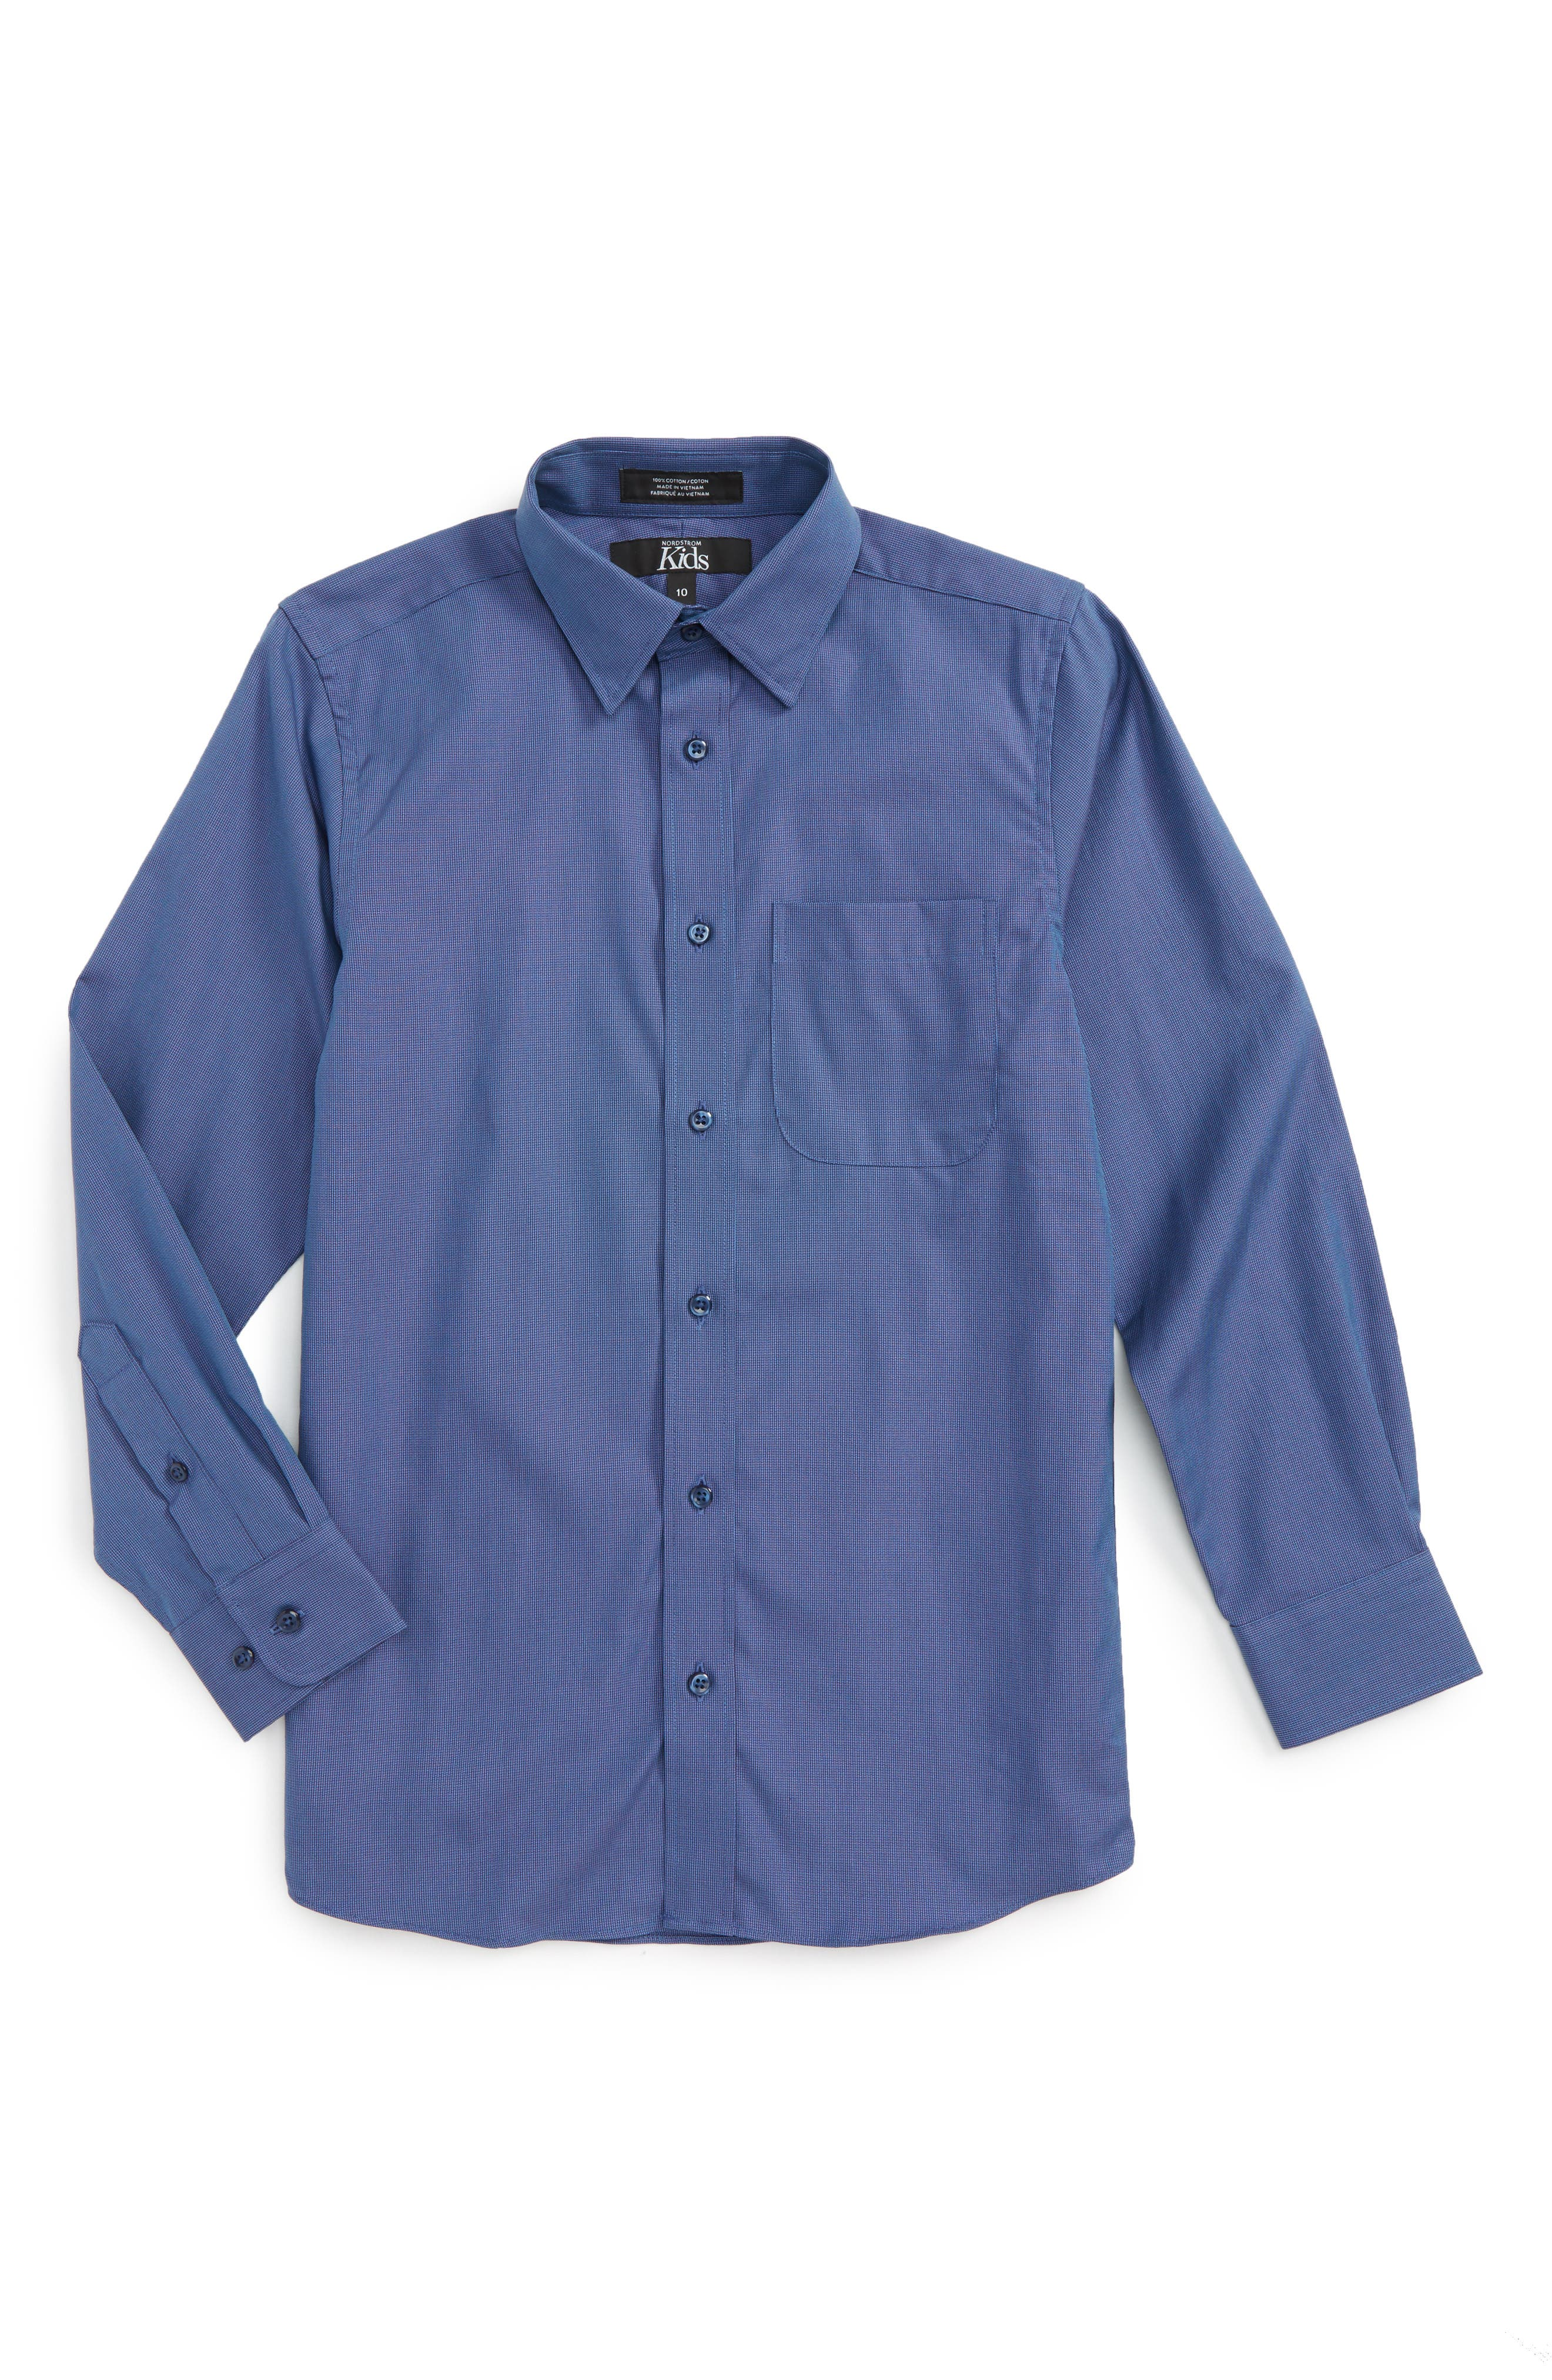 Main Image - Nordstrom Patriot Cotton Poplin Dress Shirt (Big Boys)